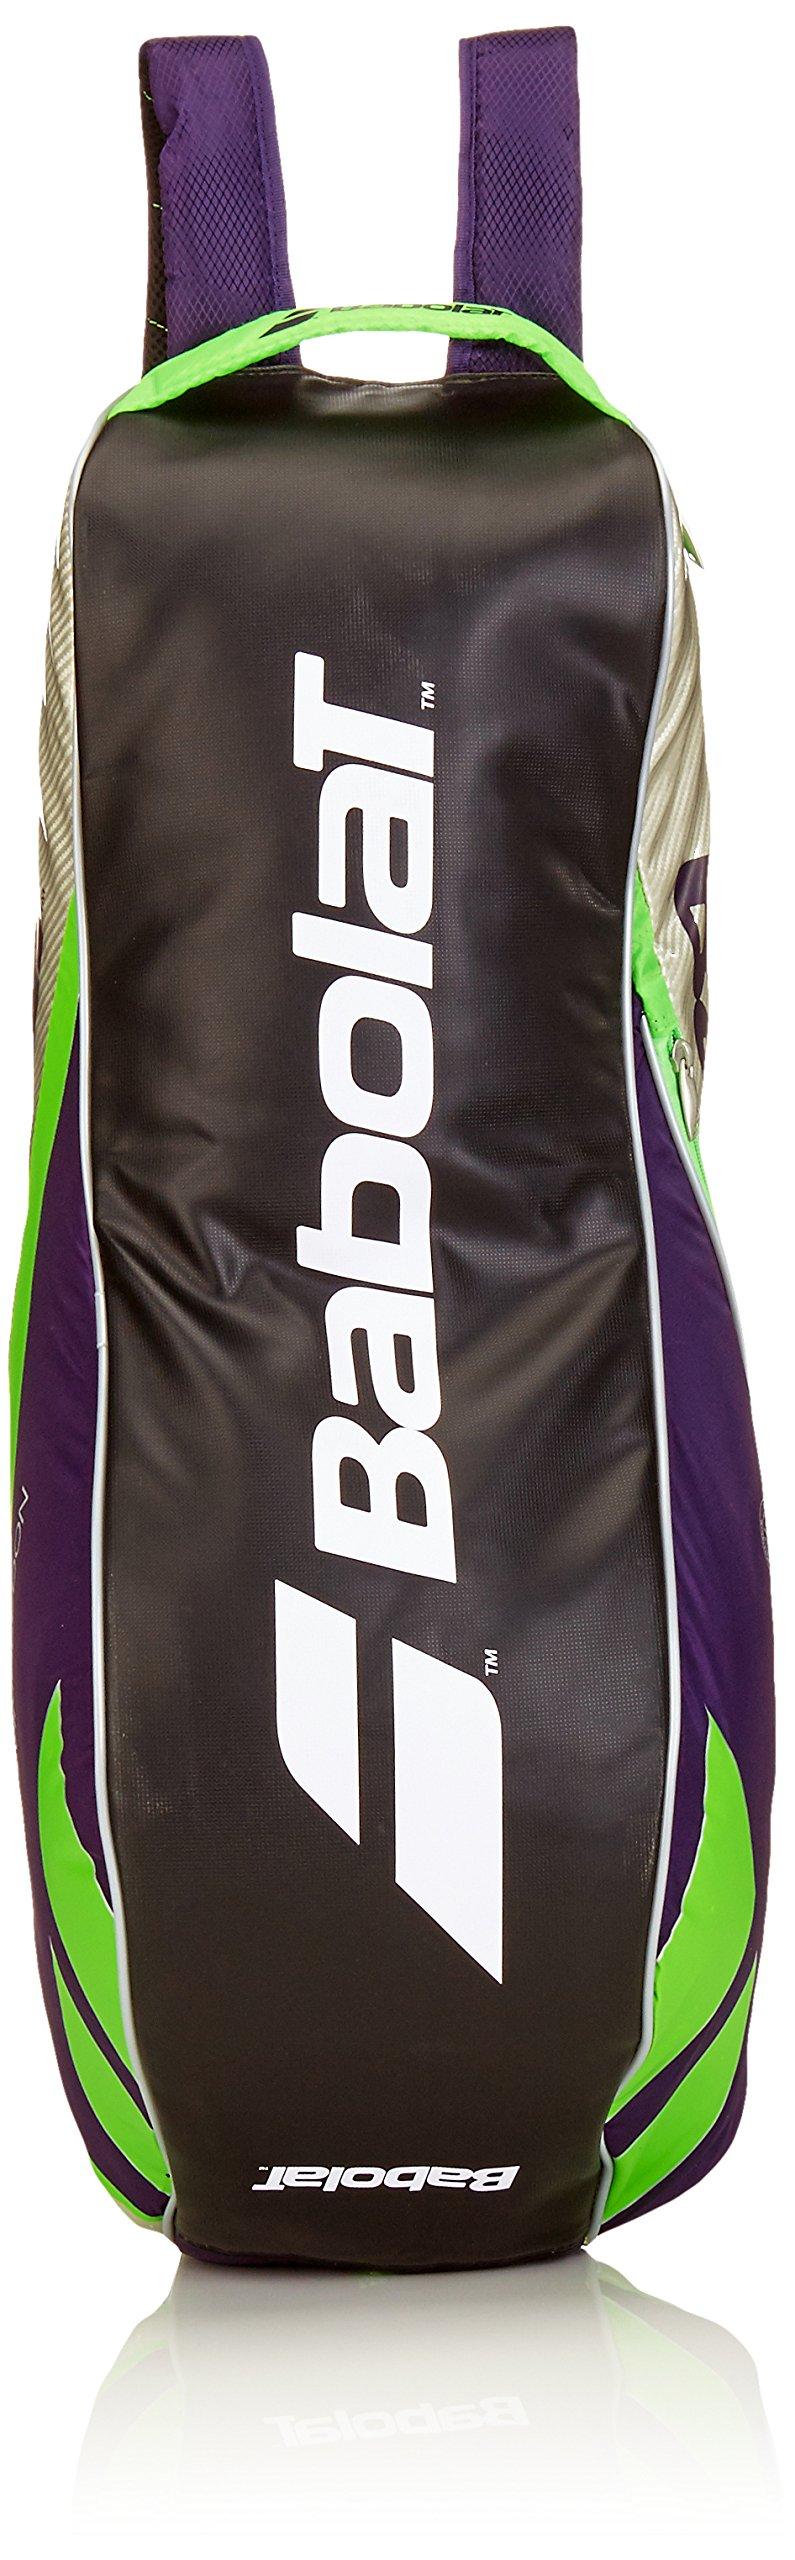 Babolat 2016 Pure Strike Wimbledon (6-Pack) Tennis Bag